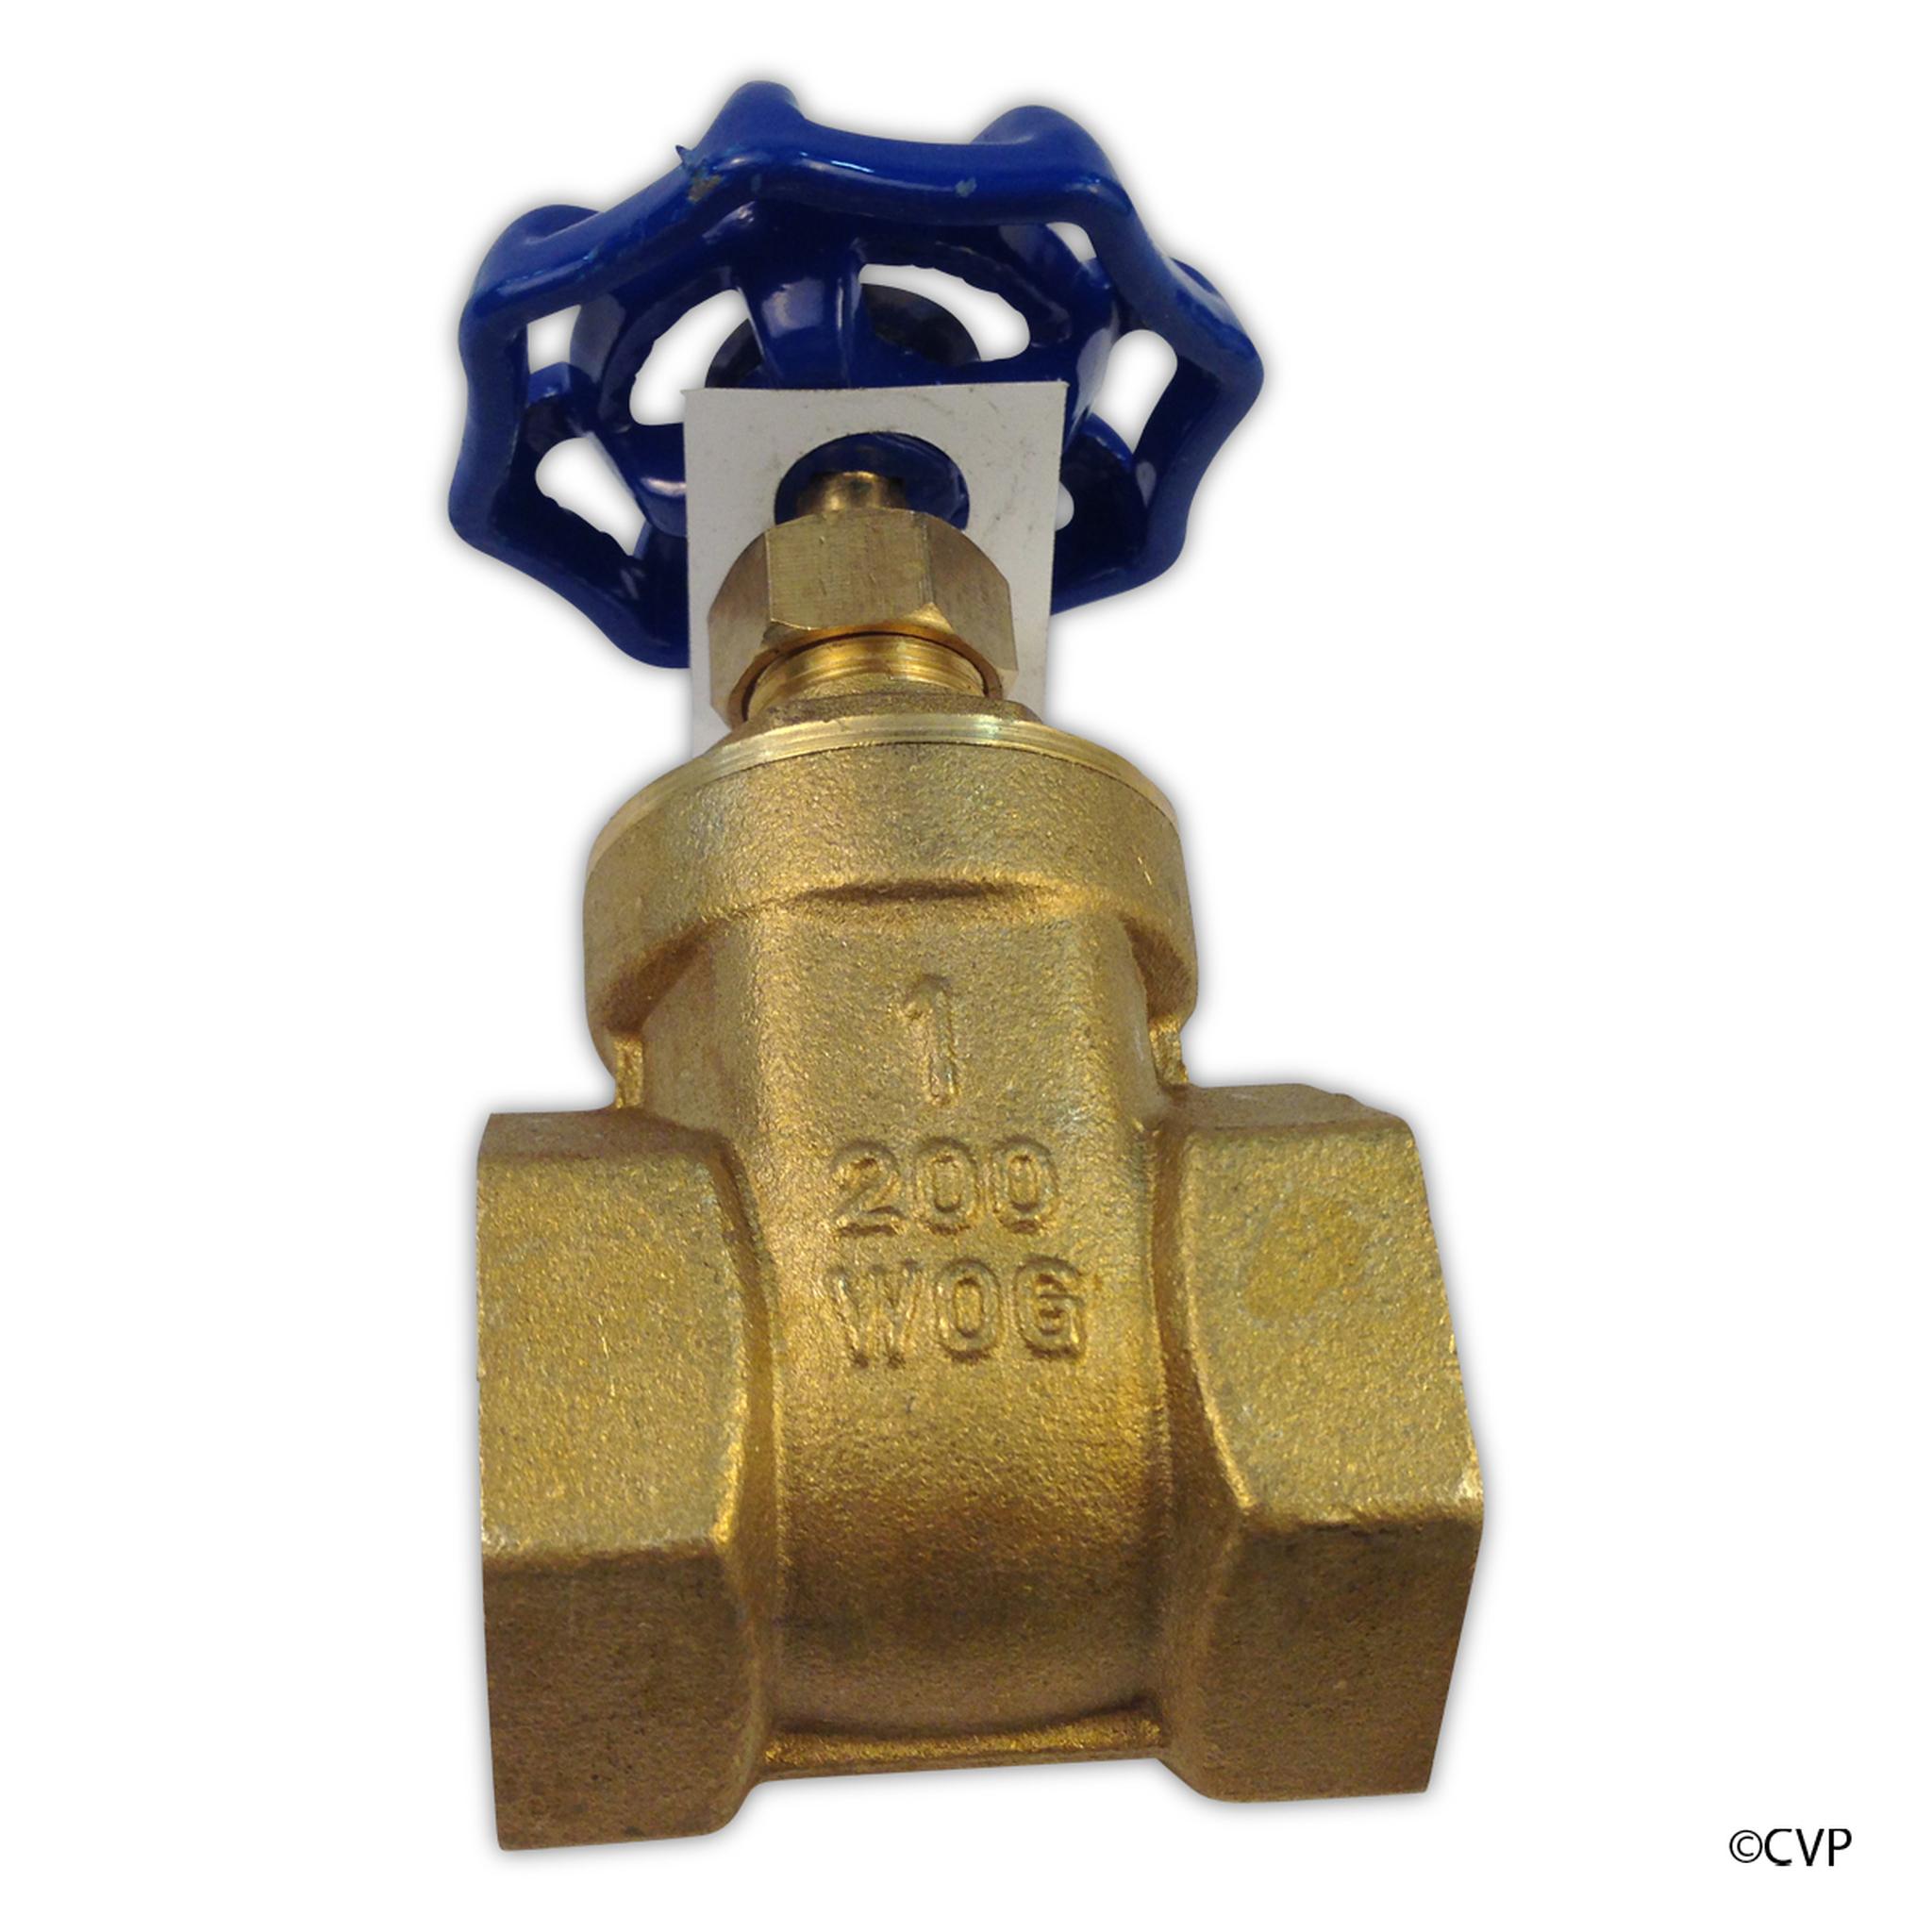 Brass & Galvanized Plumbing Parts